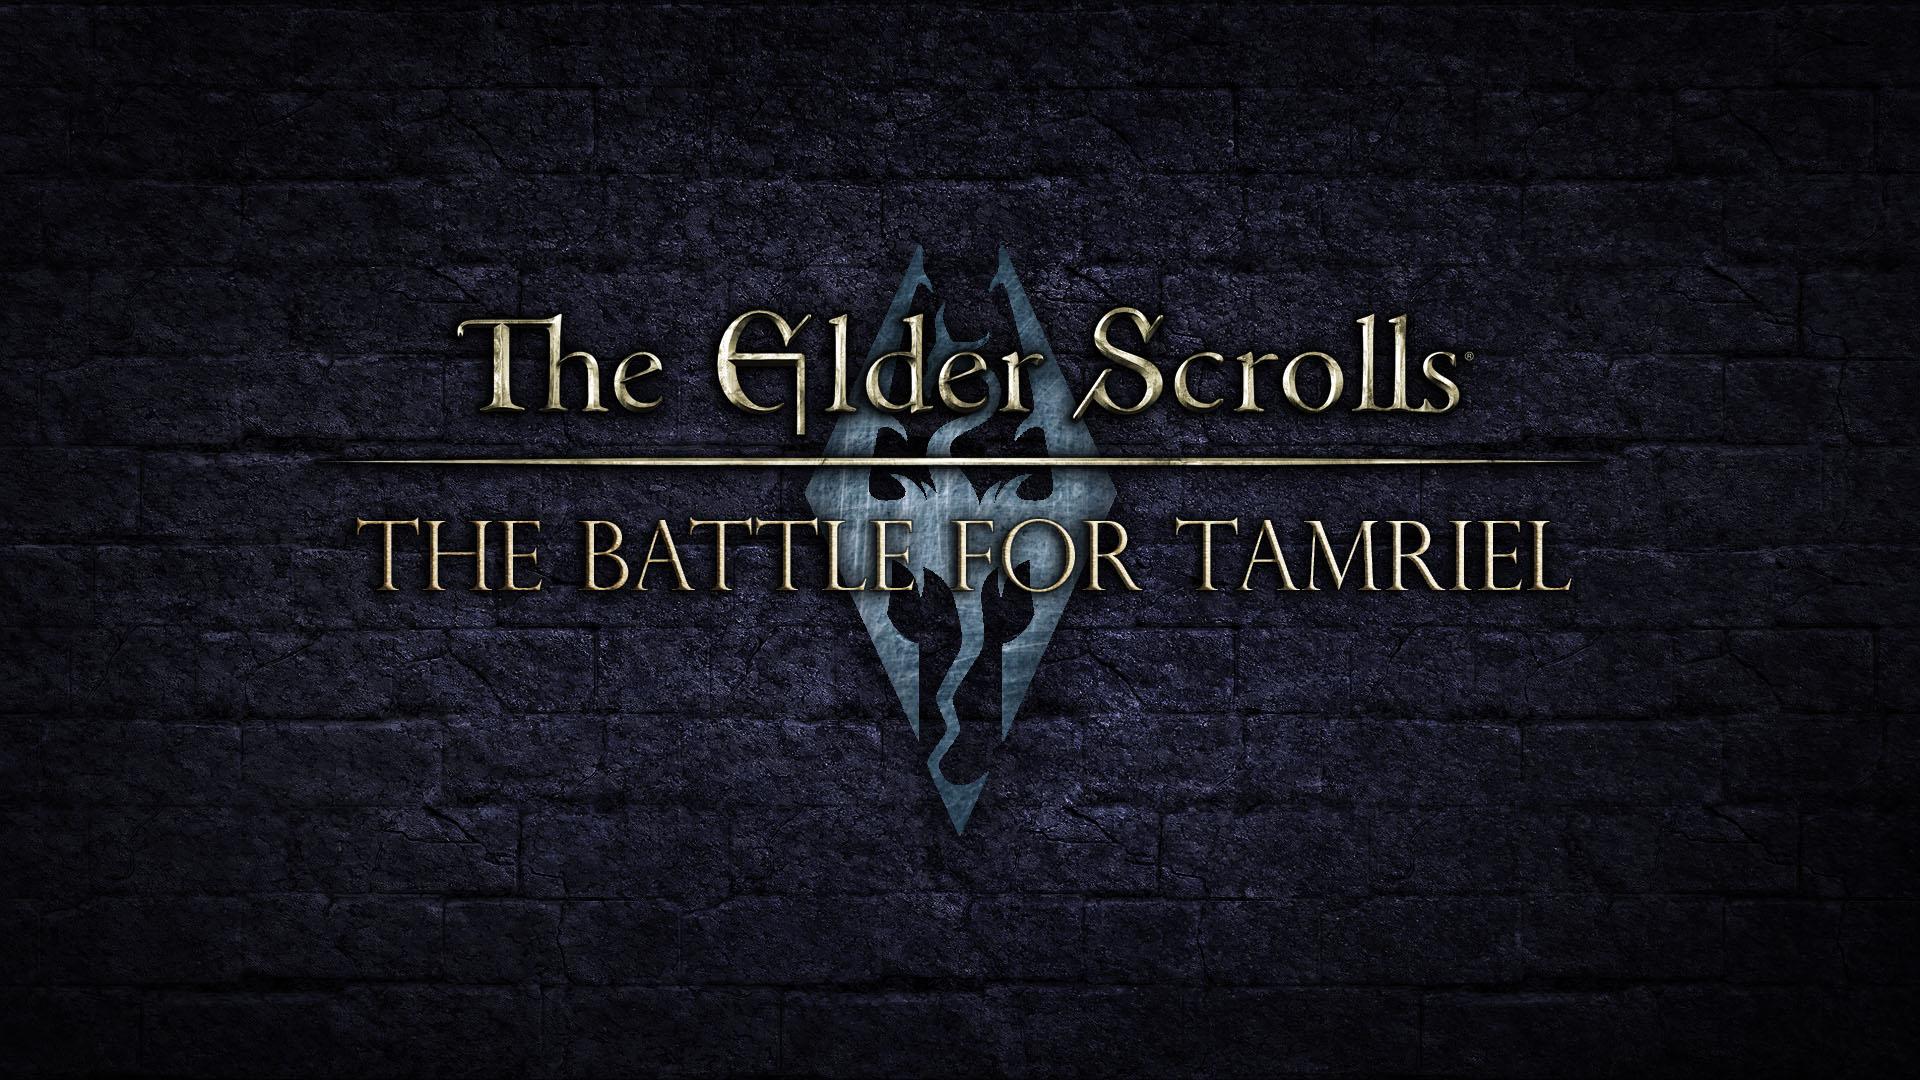 Battle for Tamriel